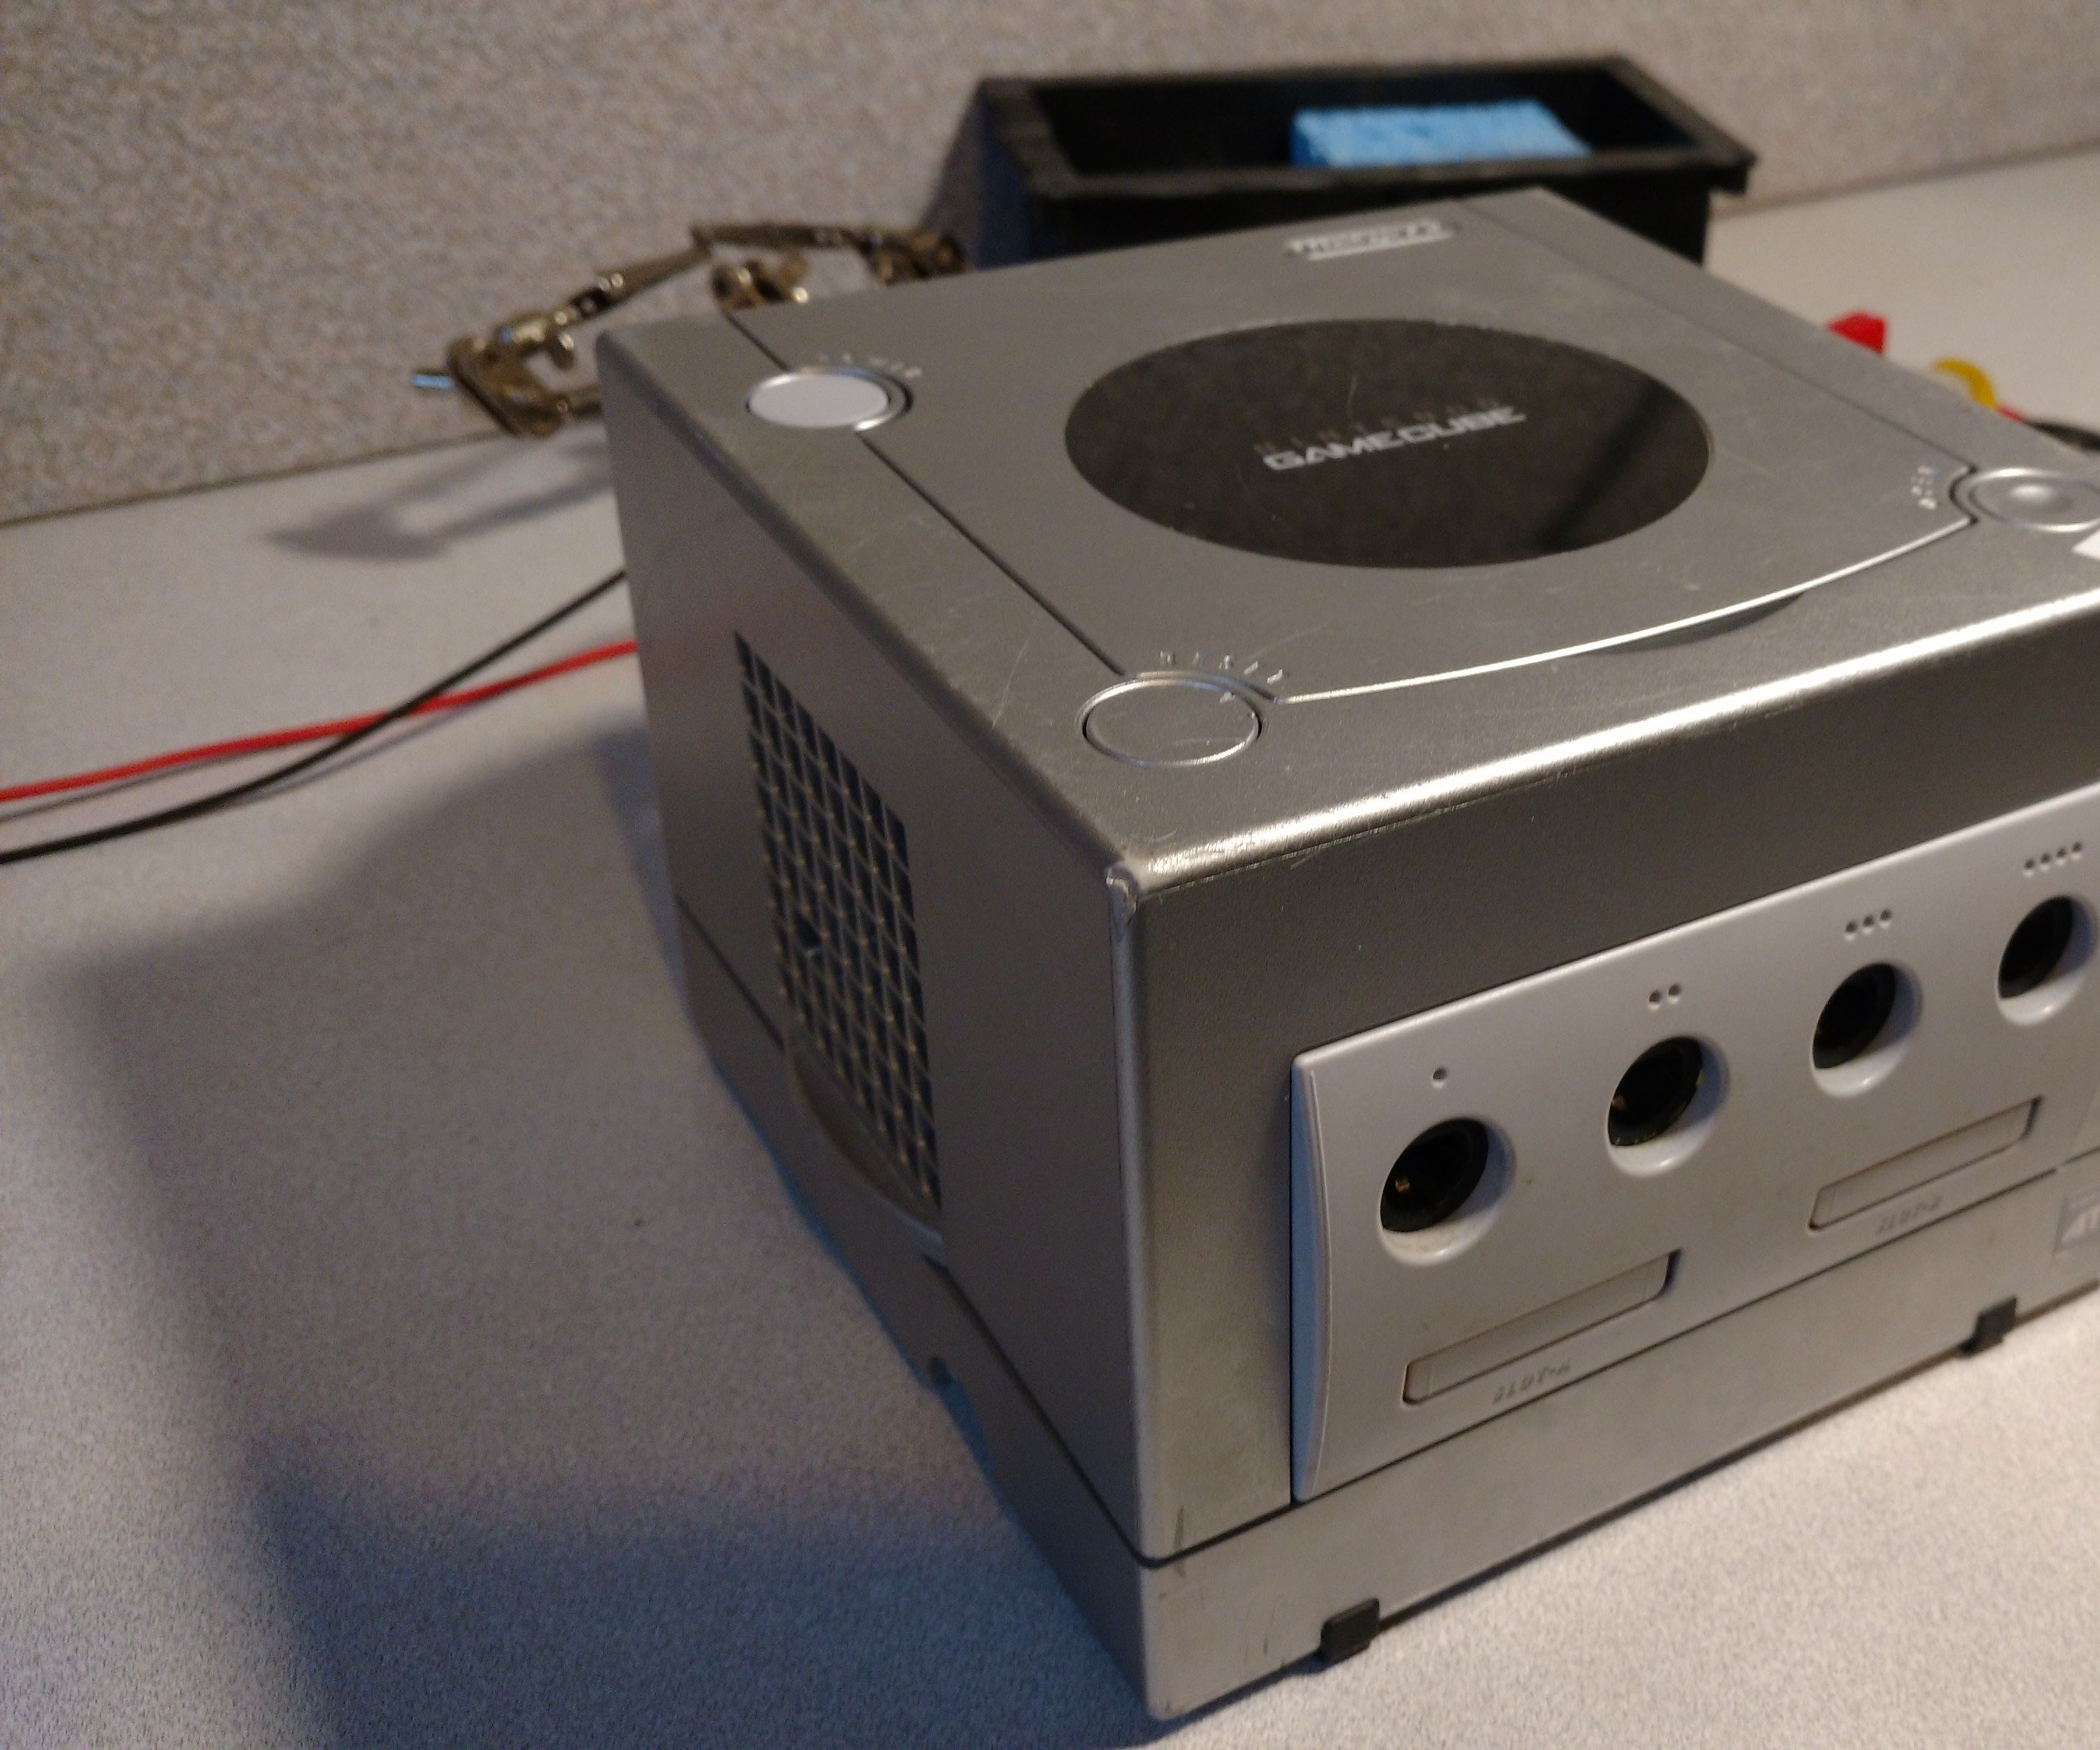 Retropie Gamecube case Project